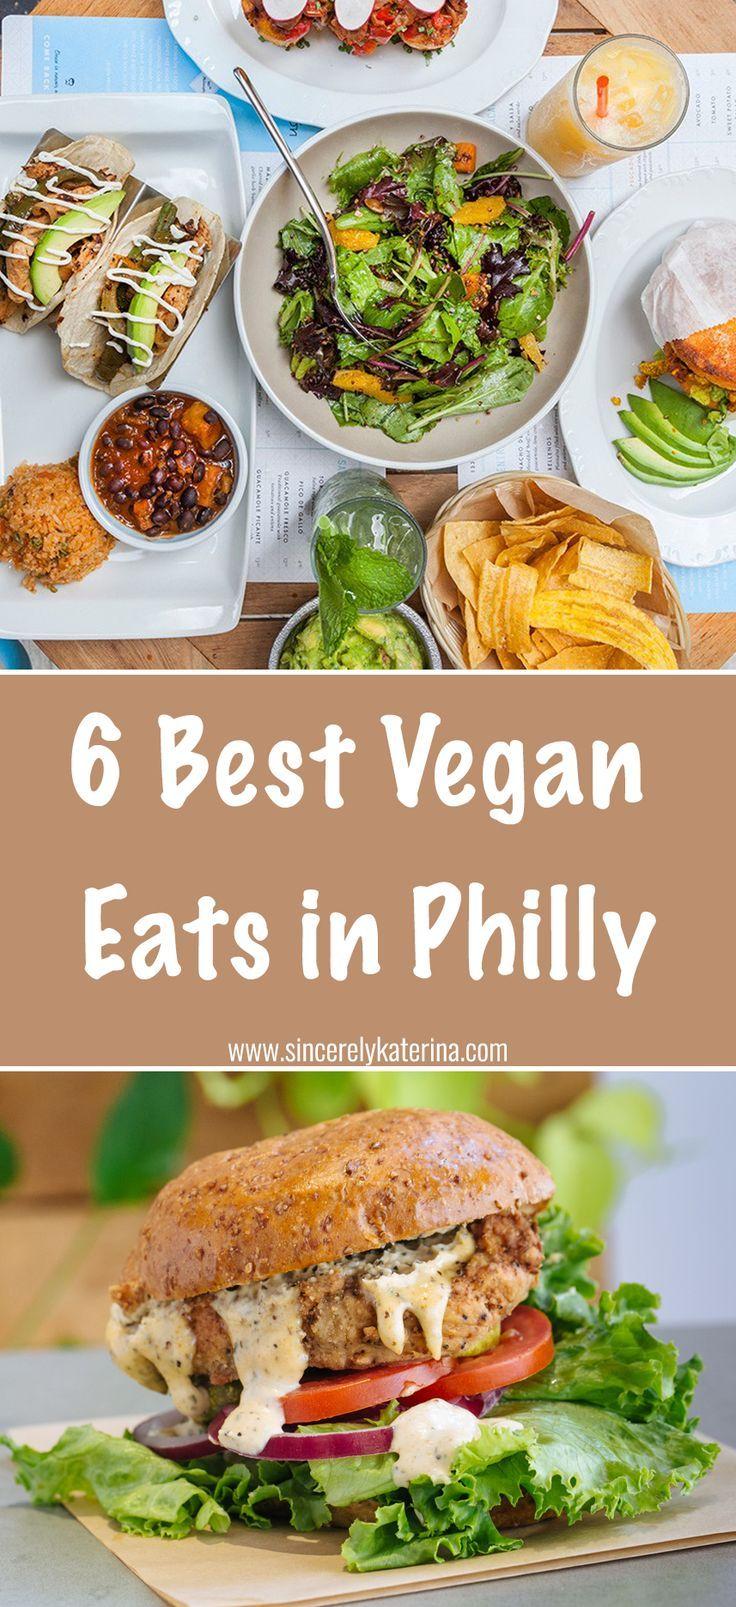 Philly S Best Vegan Eats Sincerely Katerina Vegan Eating Delicious Vegan Recipes Eat